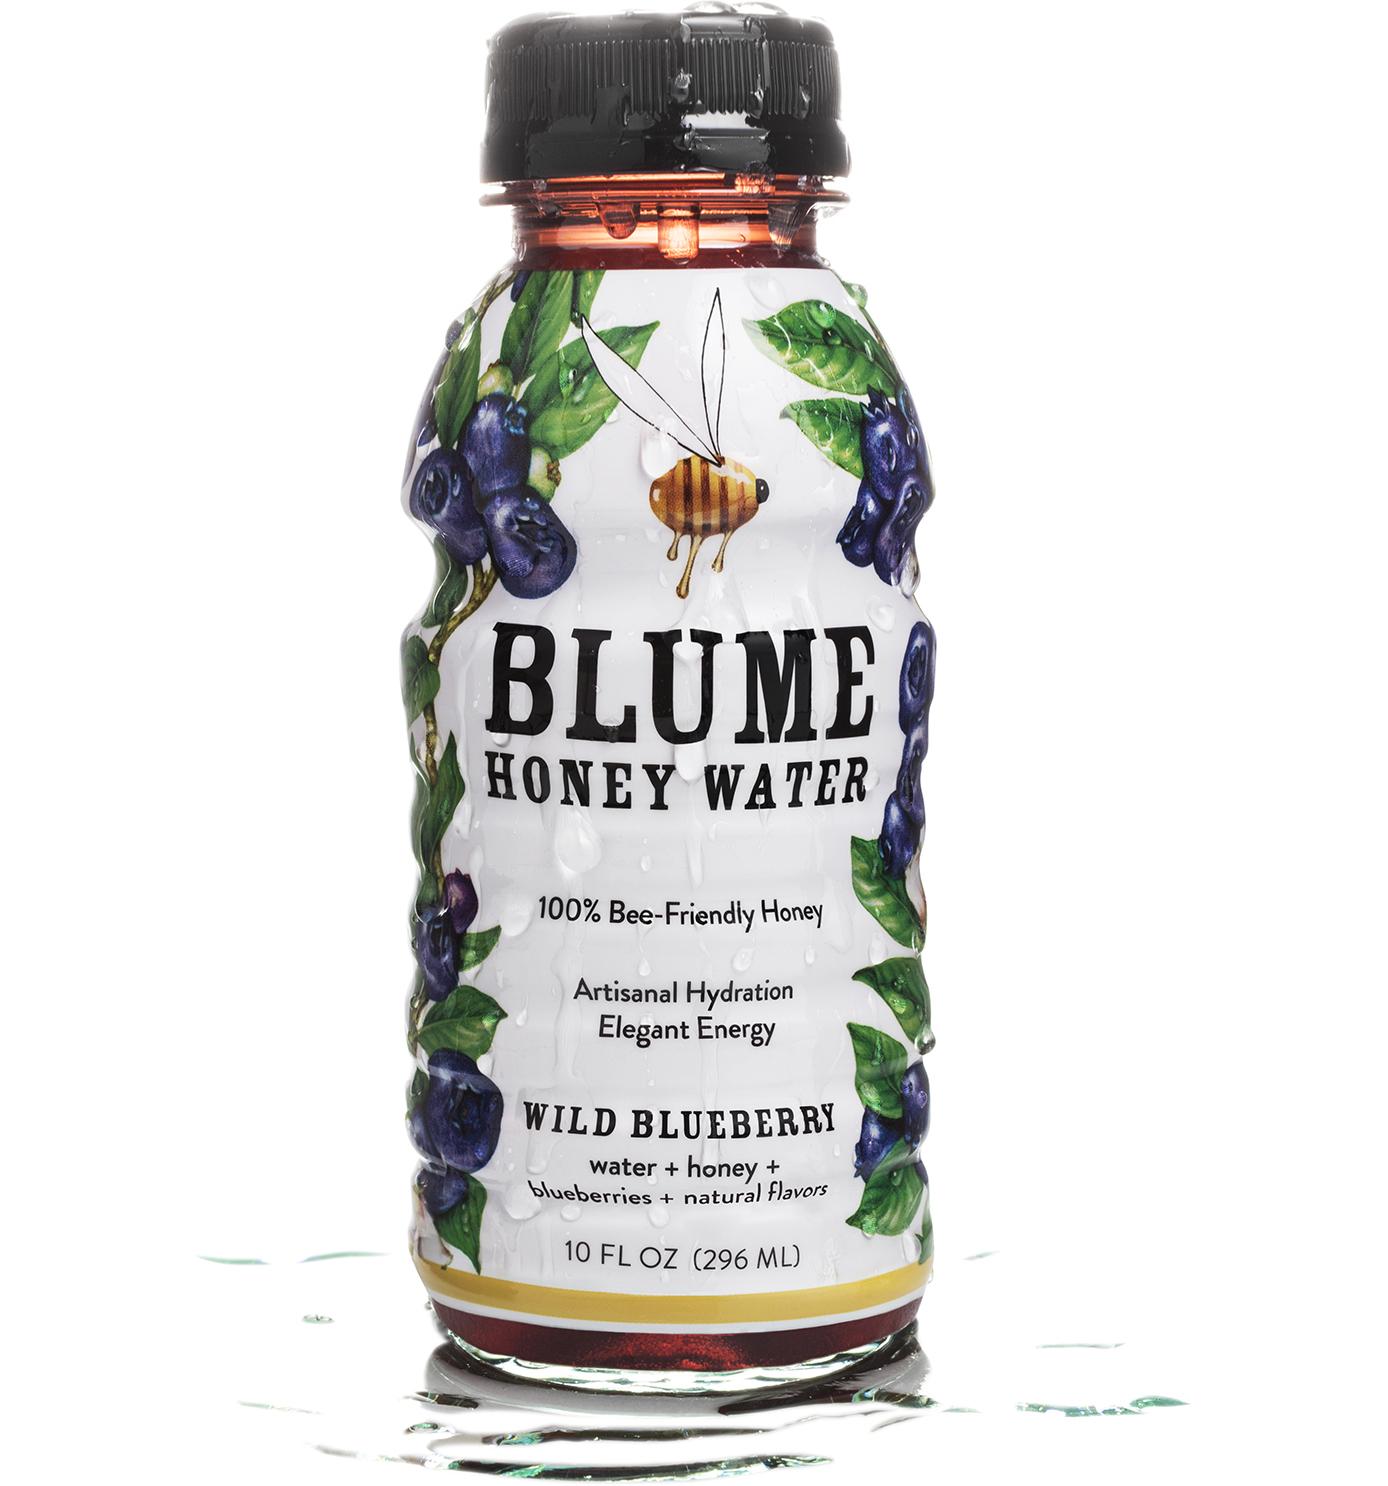 BlumeHoneyWater_WildBlueberry.jpg